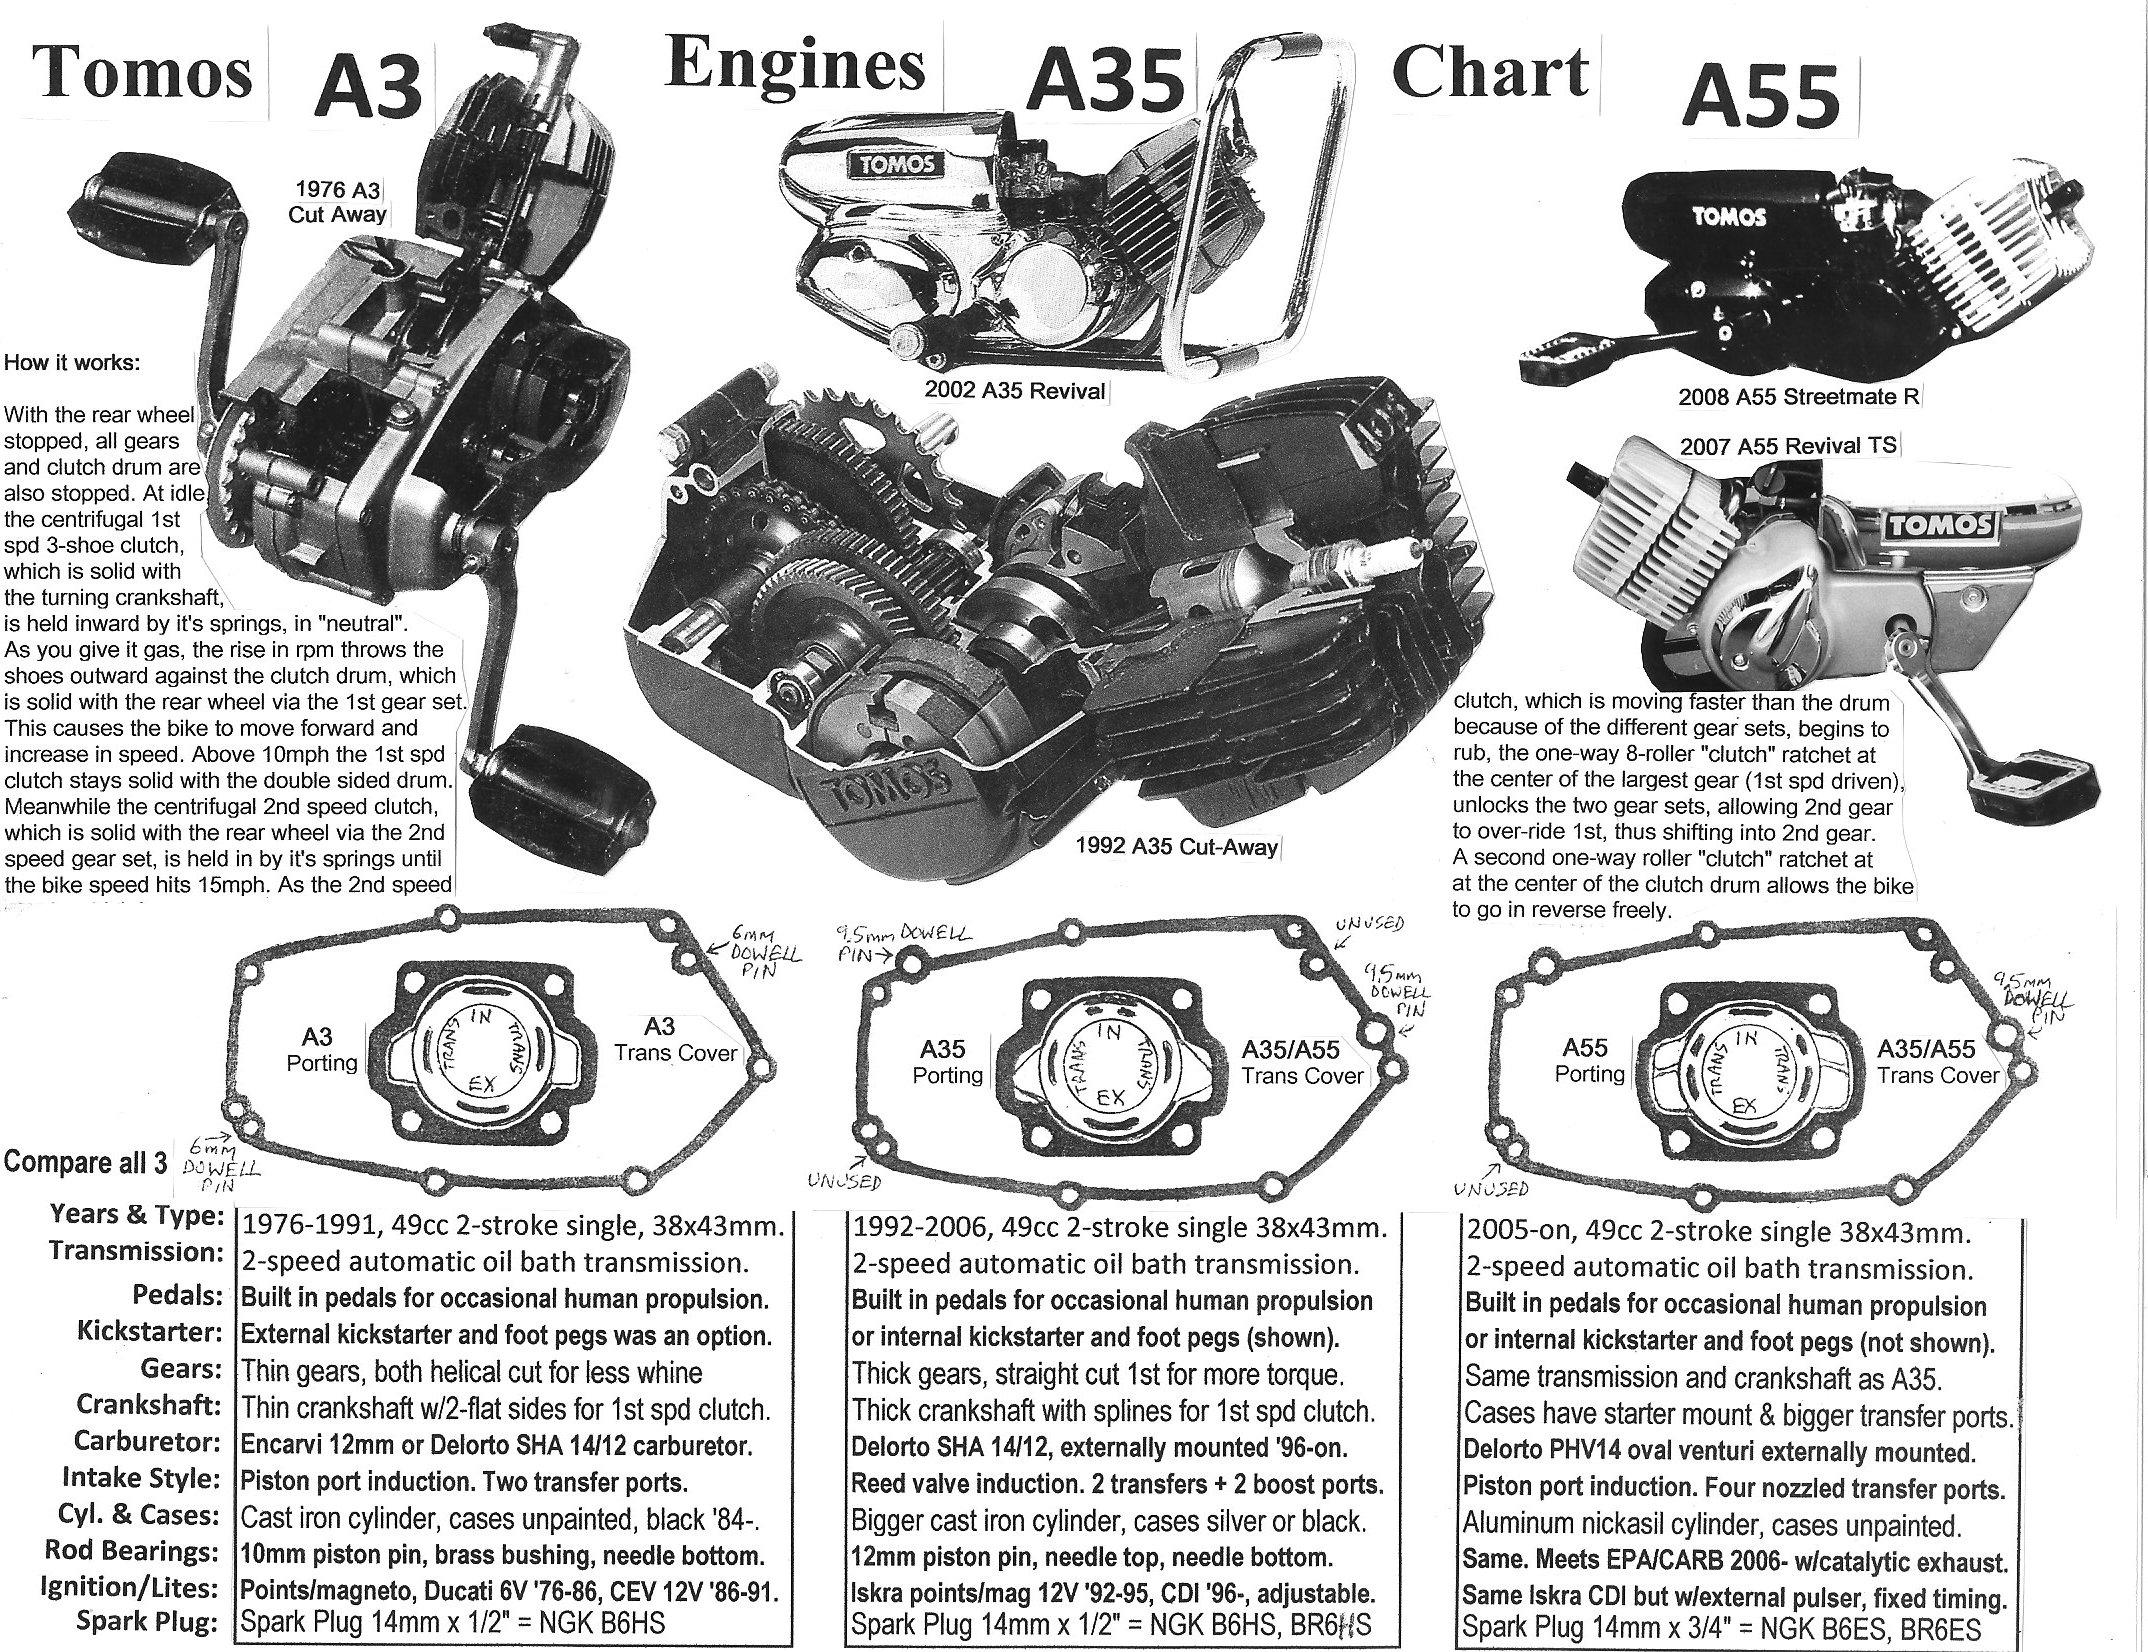 2000 harley davidson wiring diagram 8n ford 12 volt more bikes « myrons mopeds